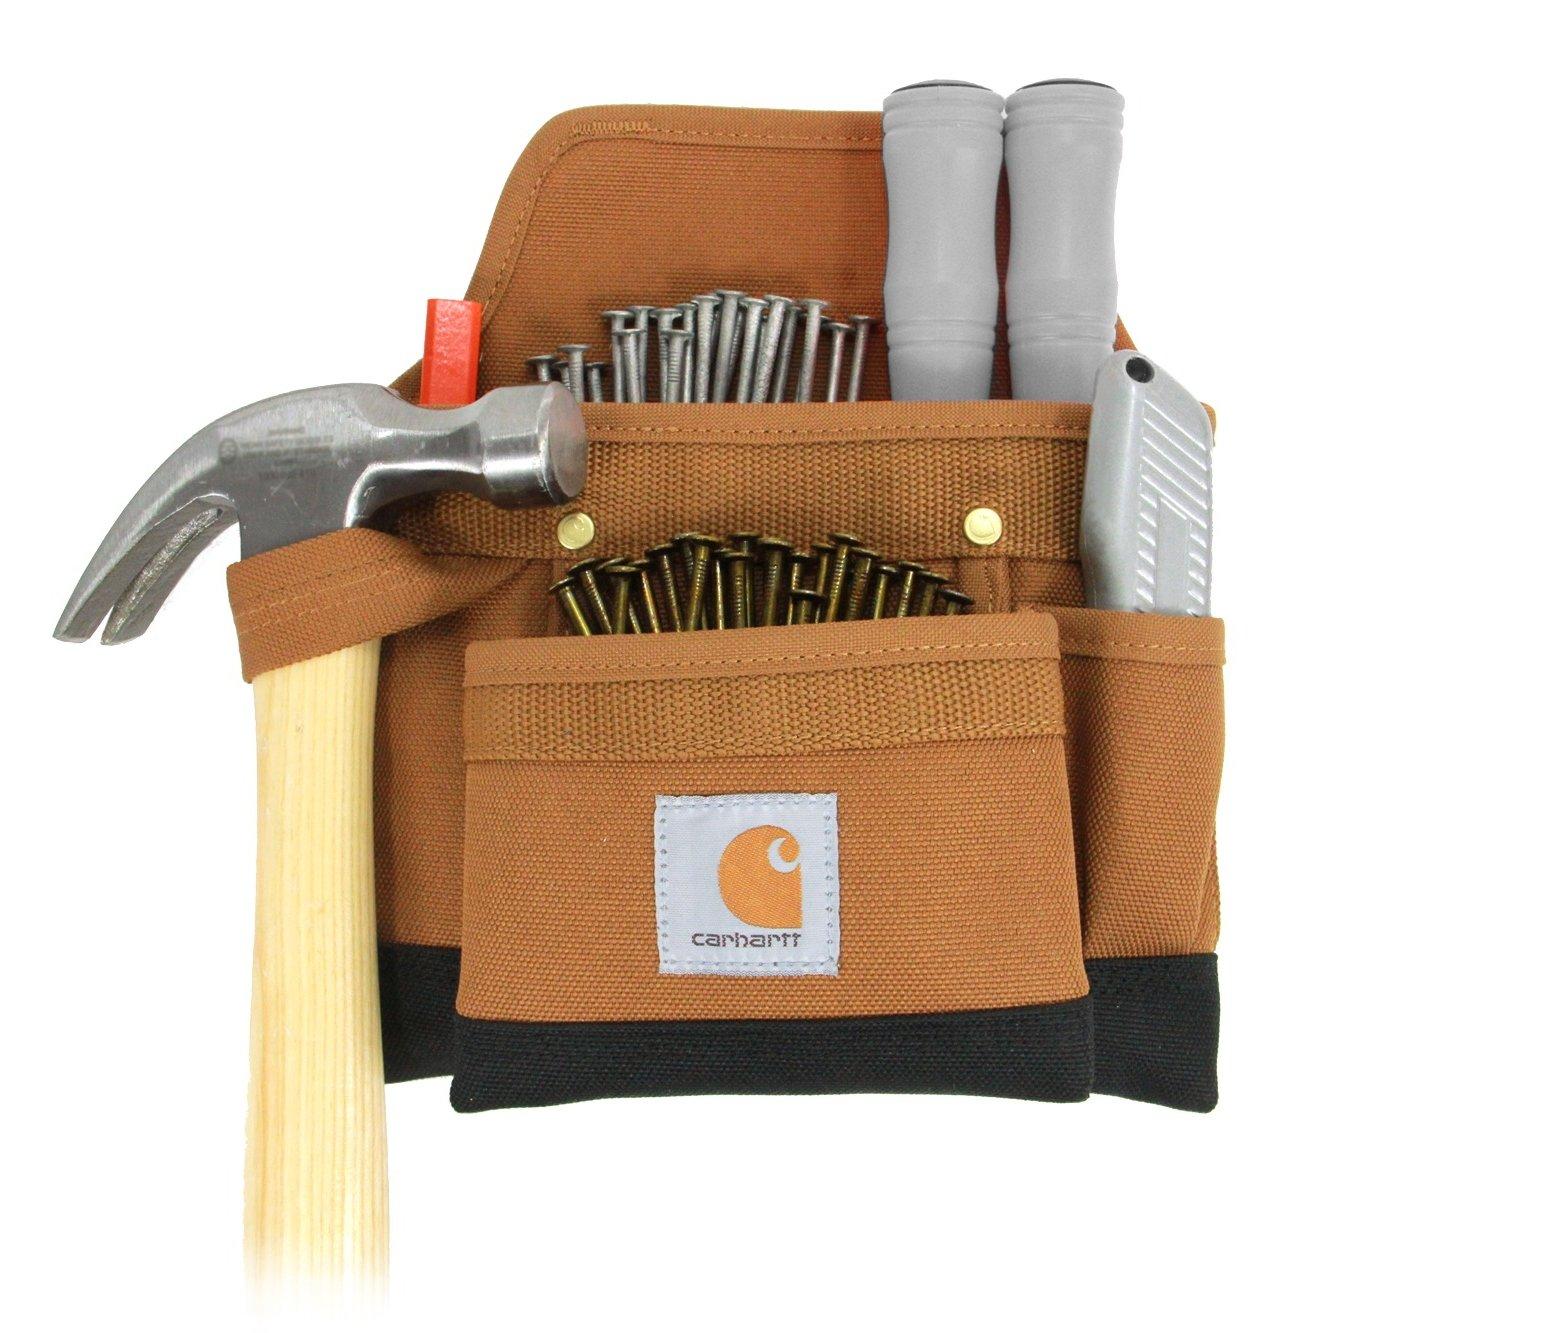 Carhartt Legacy Build Your Own Belt Custom Tool Belt Pouch, Carpenter's Pouch